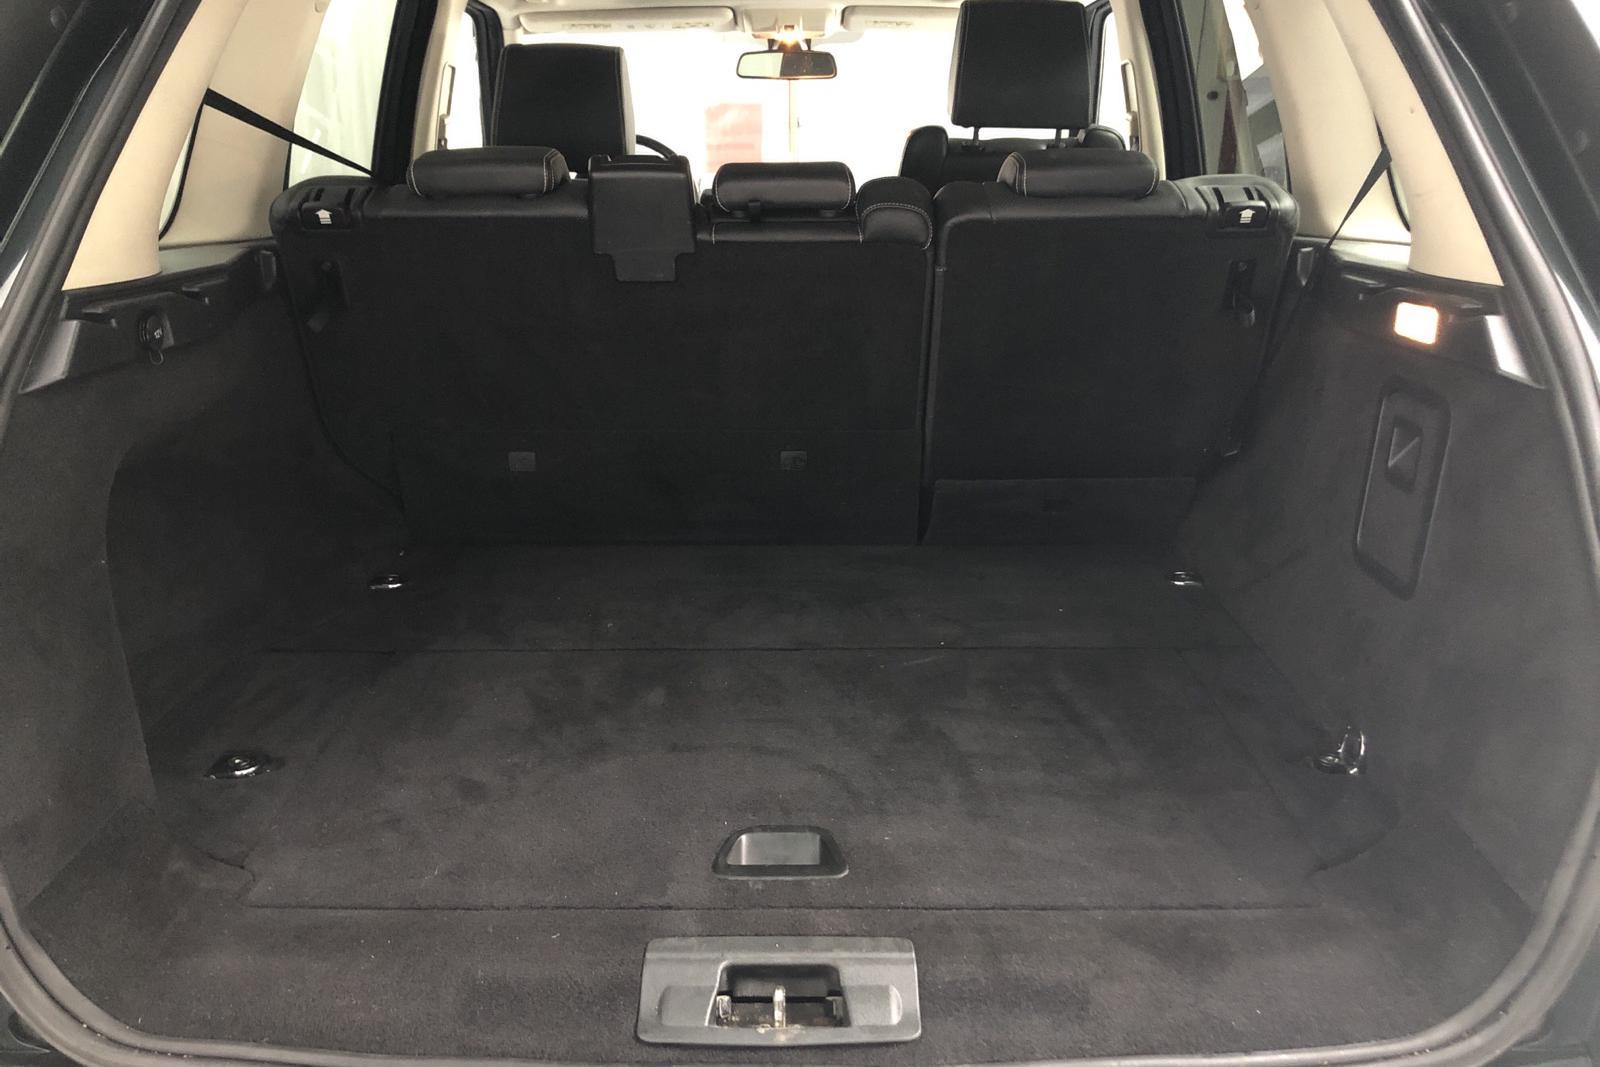 Land Rover Range Rover Sport TDV8 (272hk) - 23 695 mil - Automat - grön - 2010